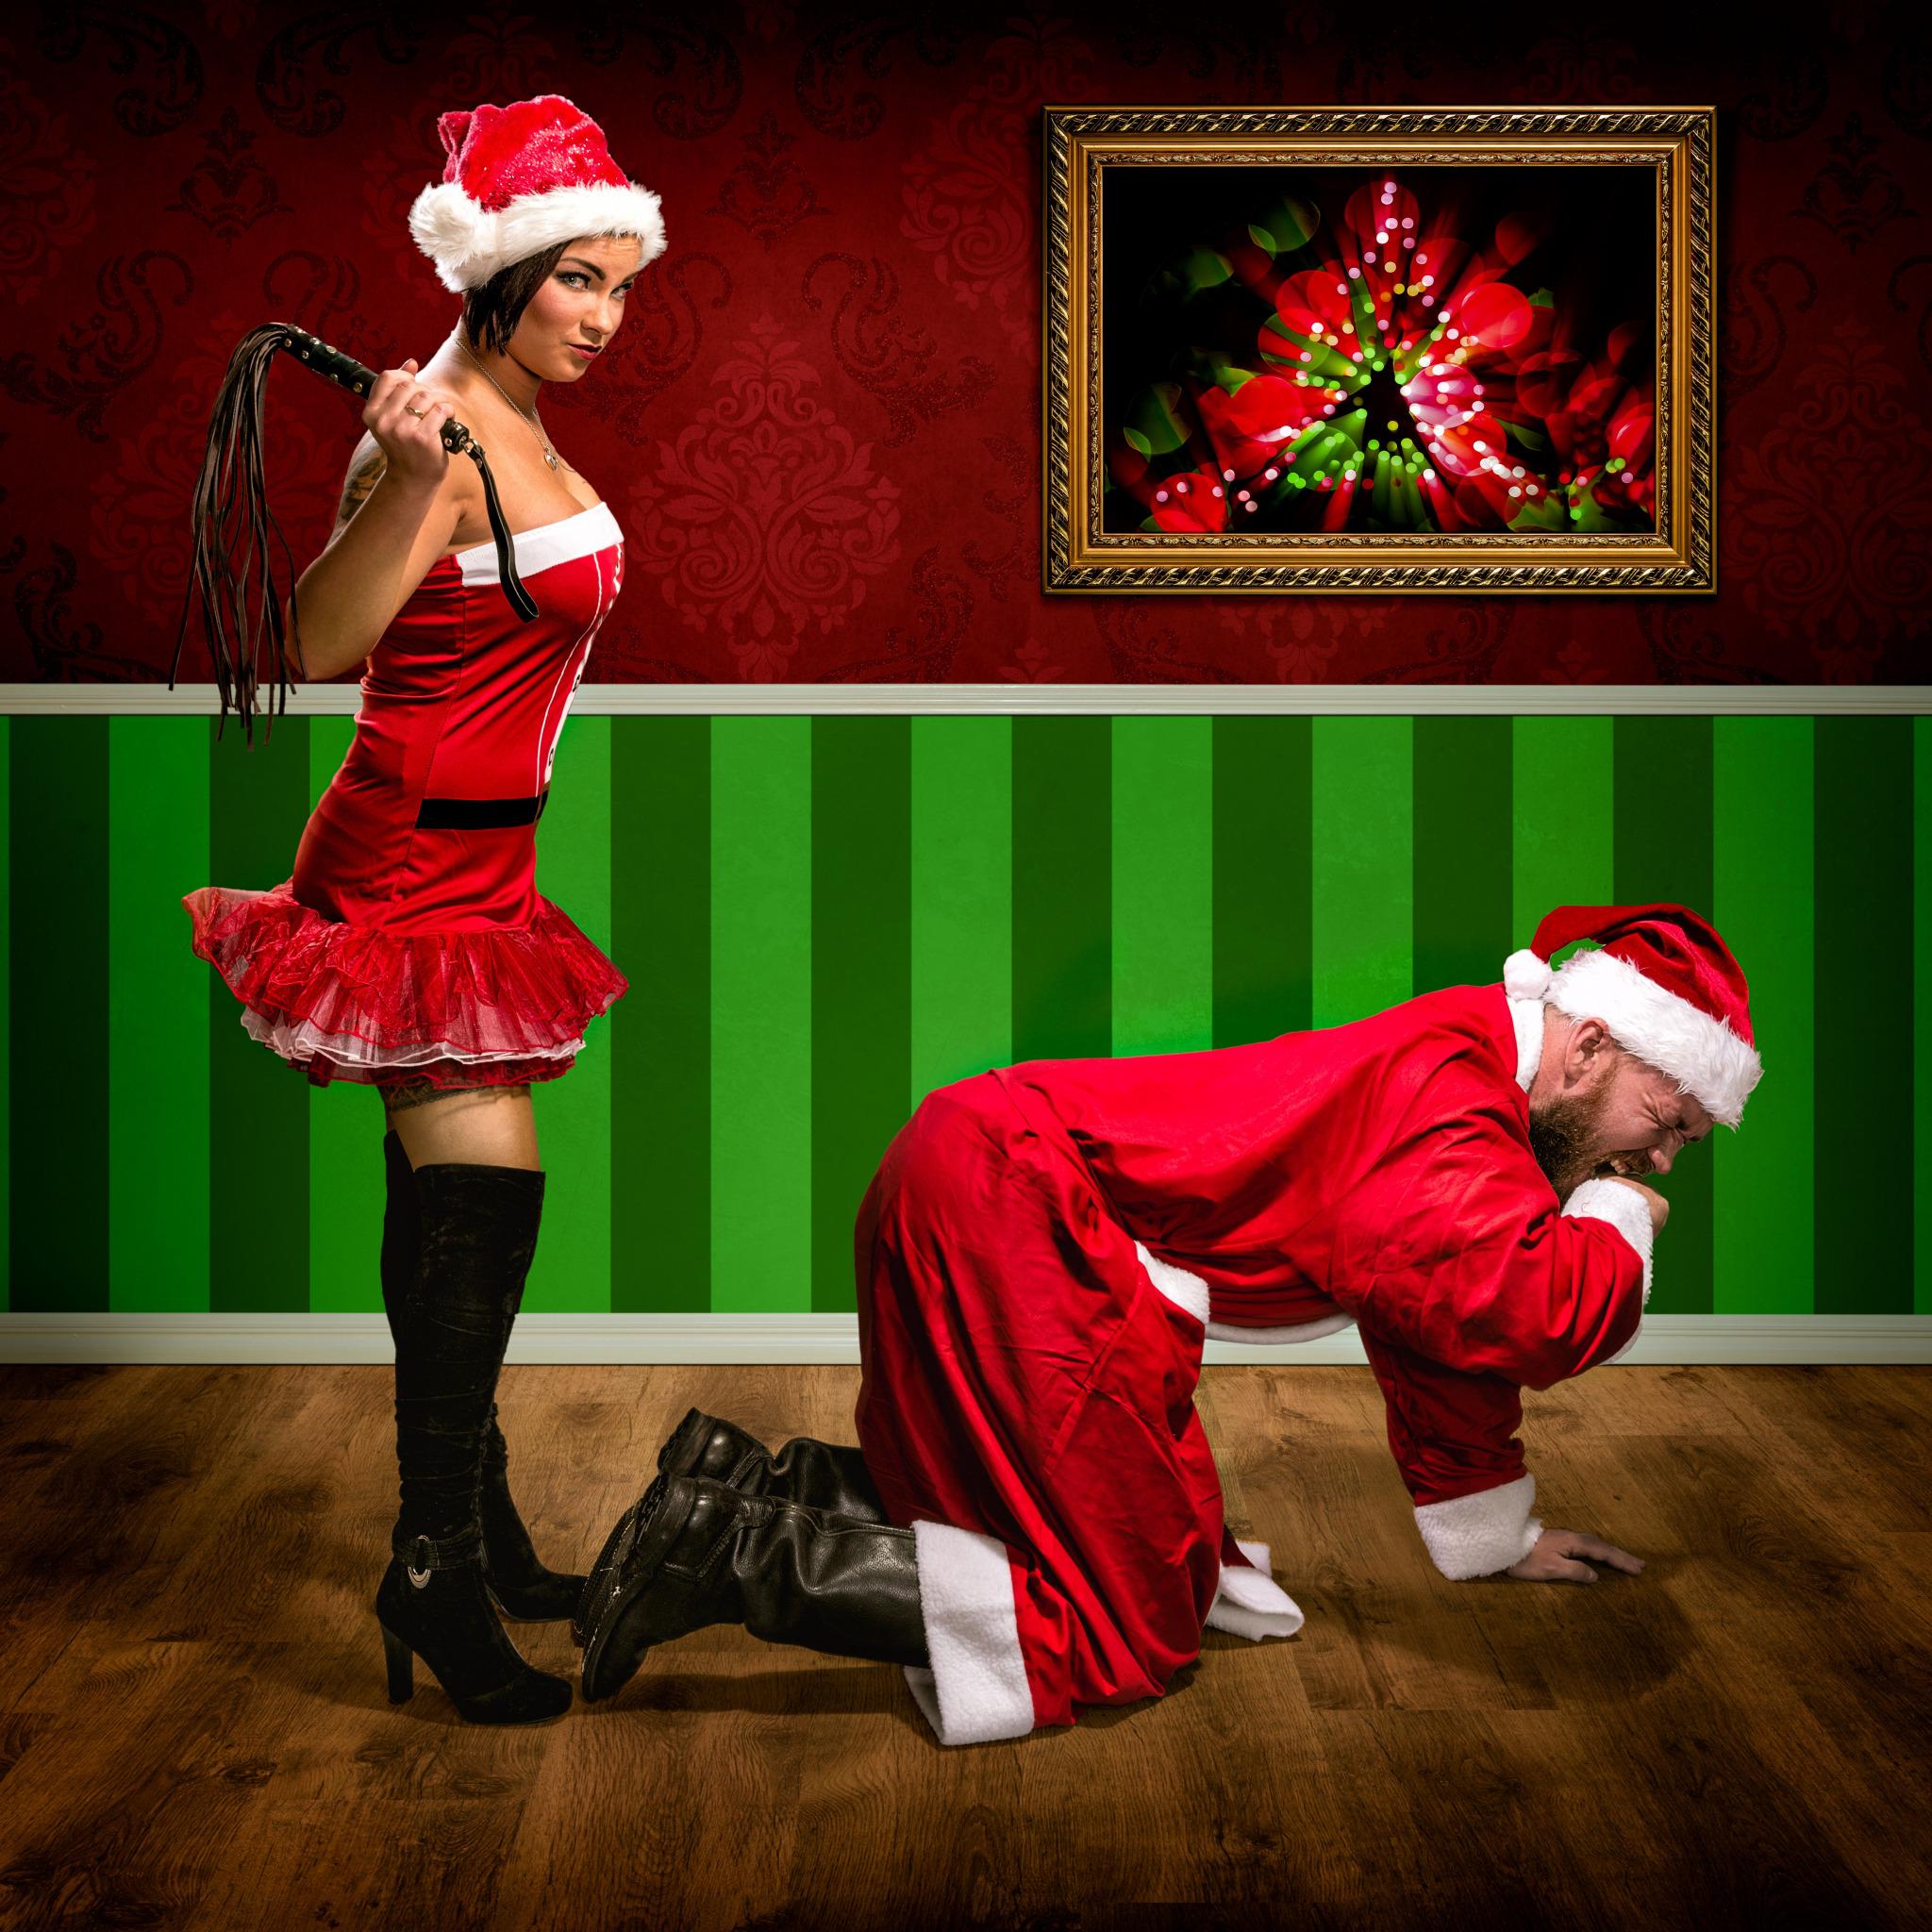 Naughty Christmas Card, Sexy Rude Adult Funny Humorous